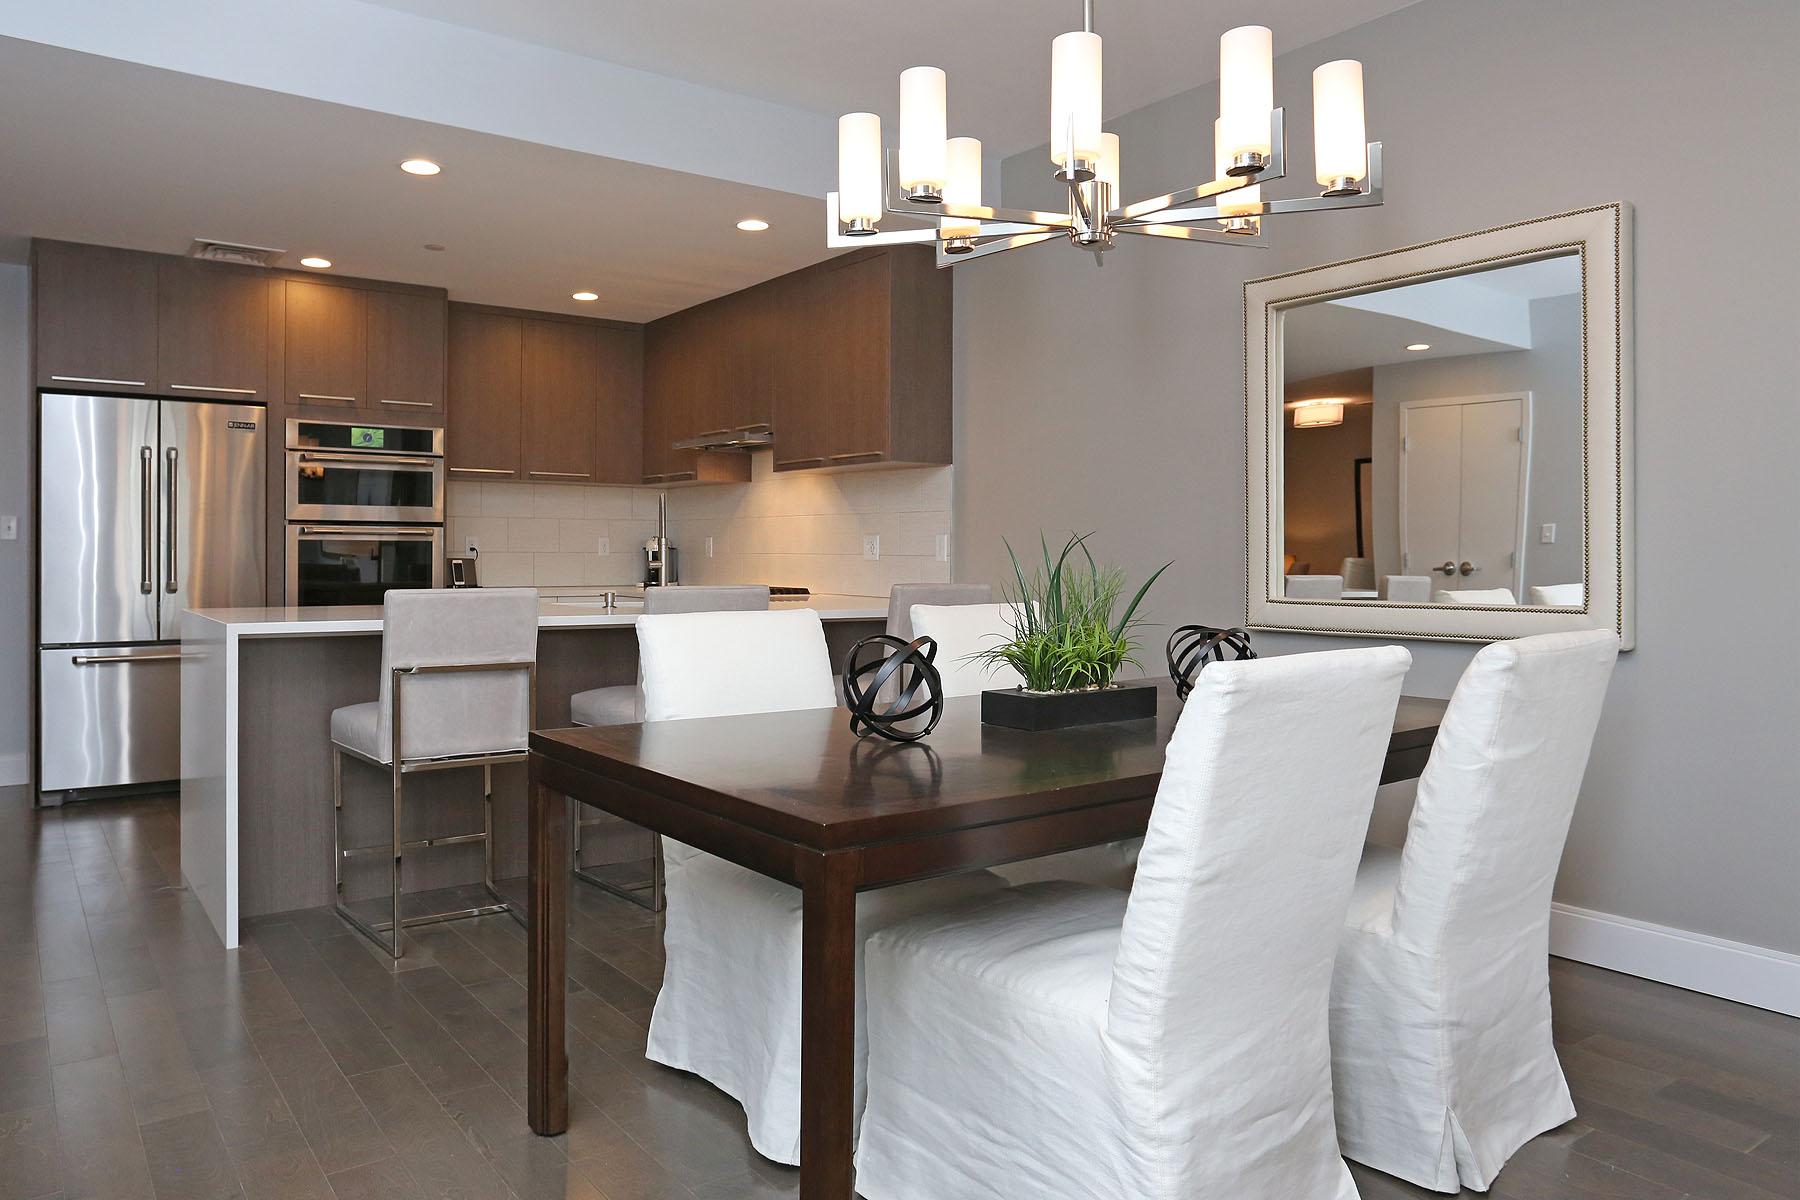 Condominium for Sale at The Allele 150 Dorchester Ave Unit 513 Boston, Massachusetts, 02127 United States